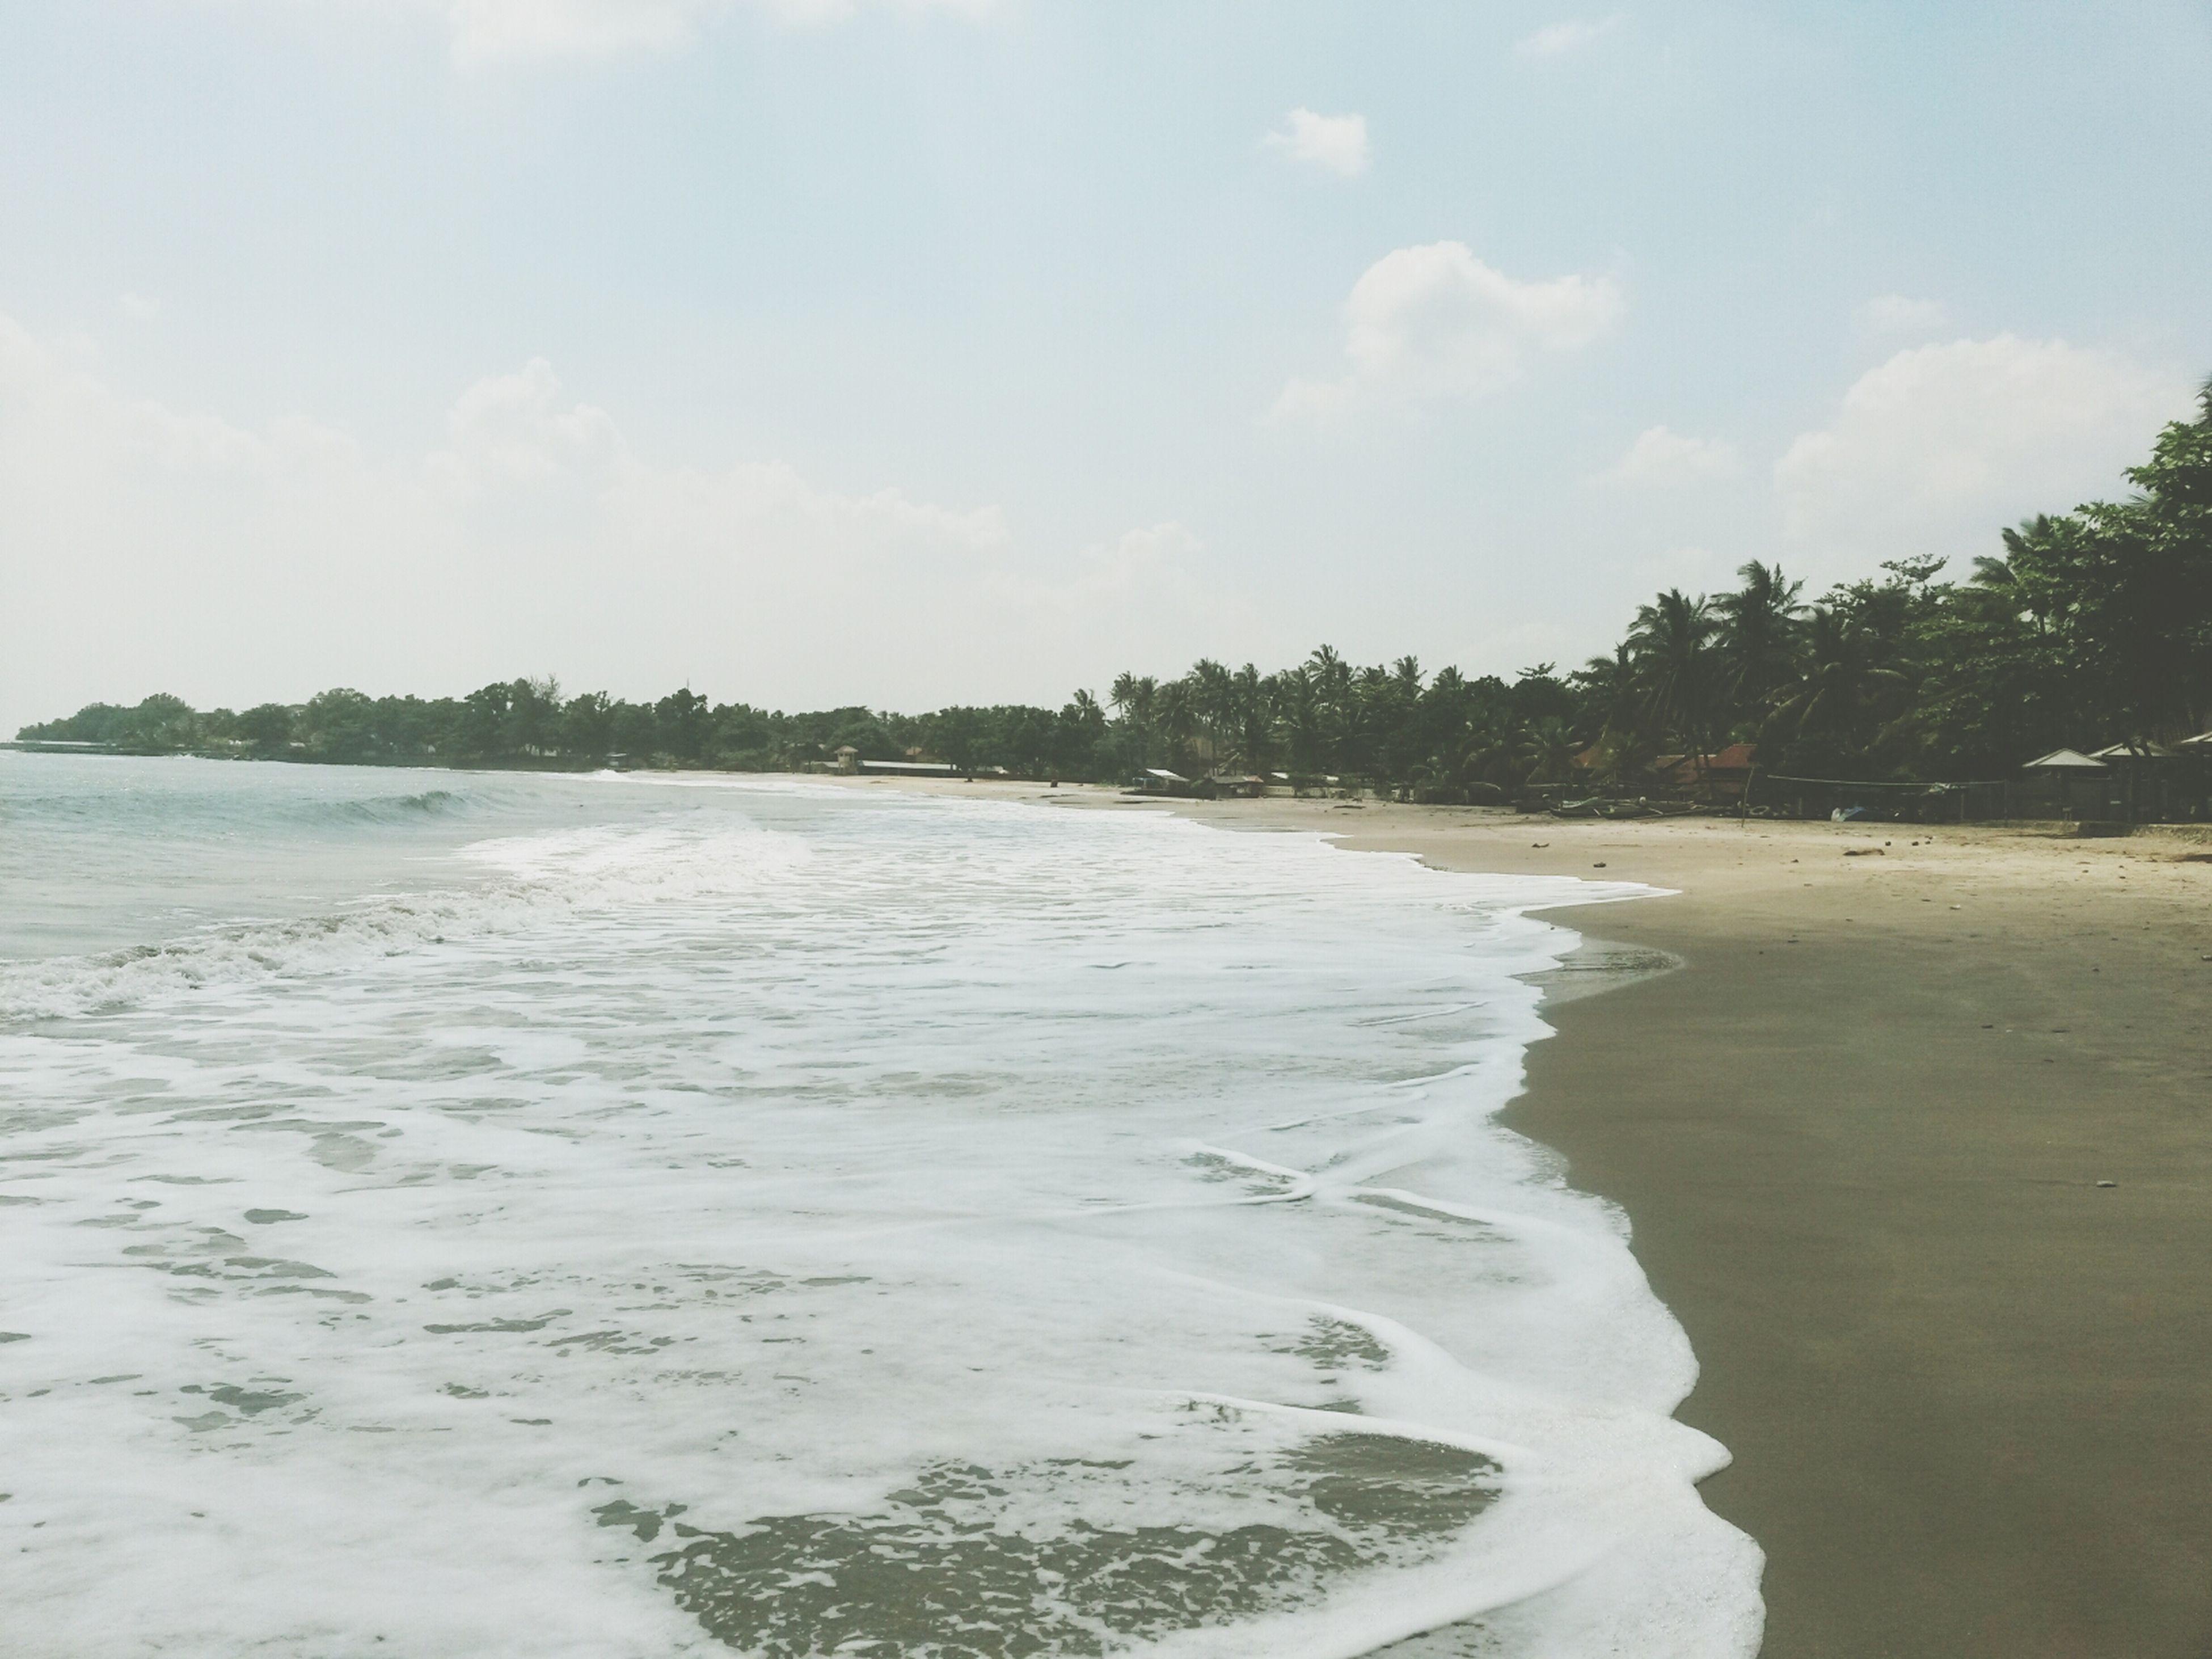 beach, water, sand, shore, sea, sky, tranquil scene, tranquility, scenics, beauty in nature, nature, tree, wave, coastline, idyllic, day, surf, cloud - sky, outdoors, non-urban scene